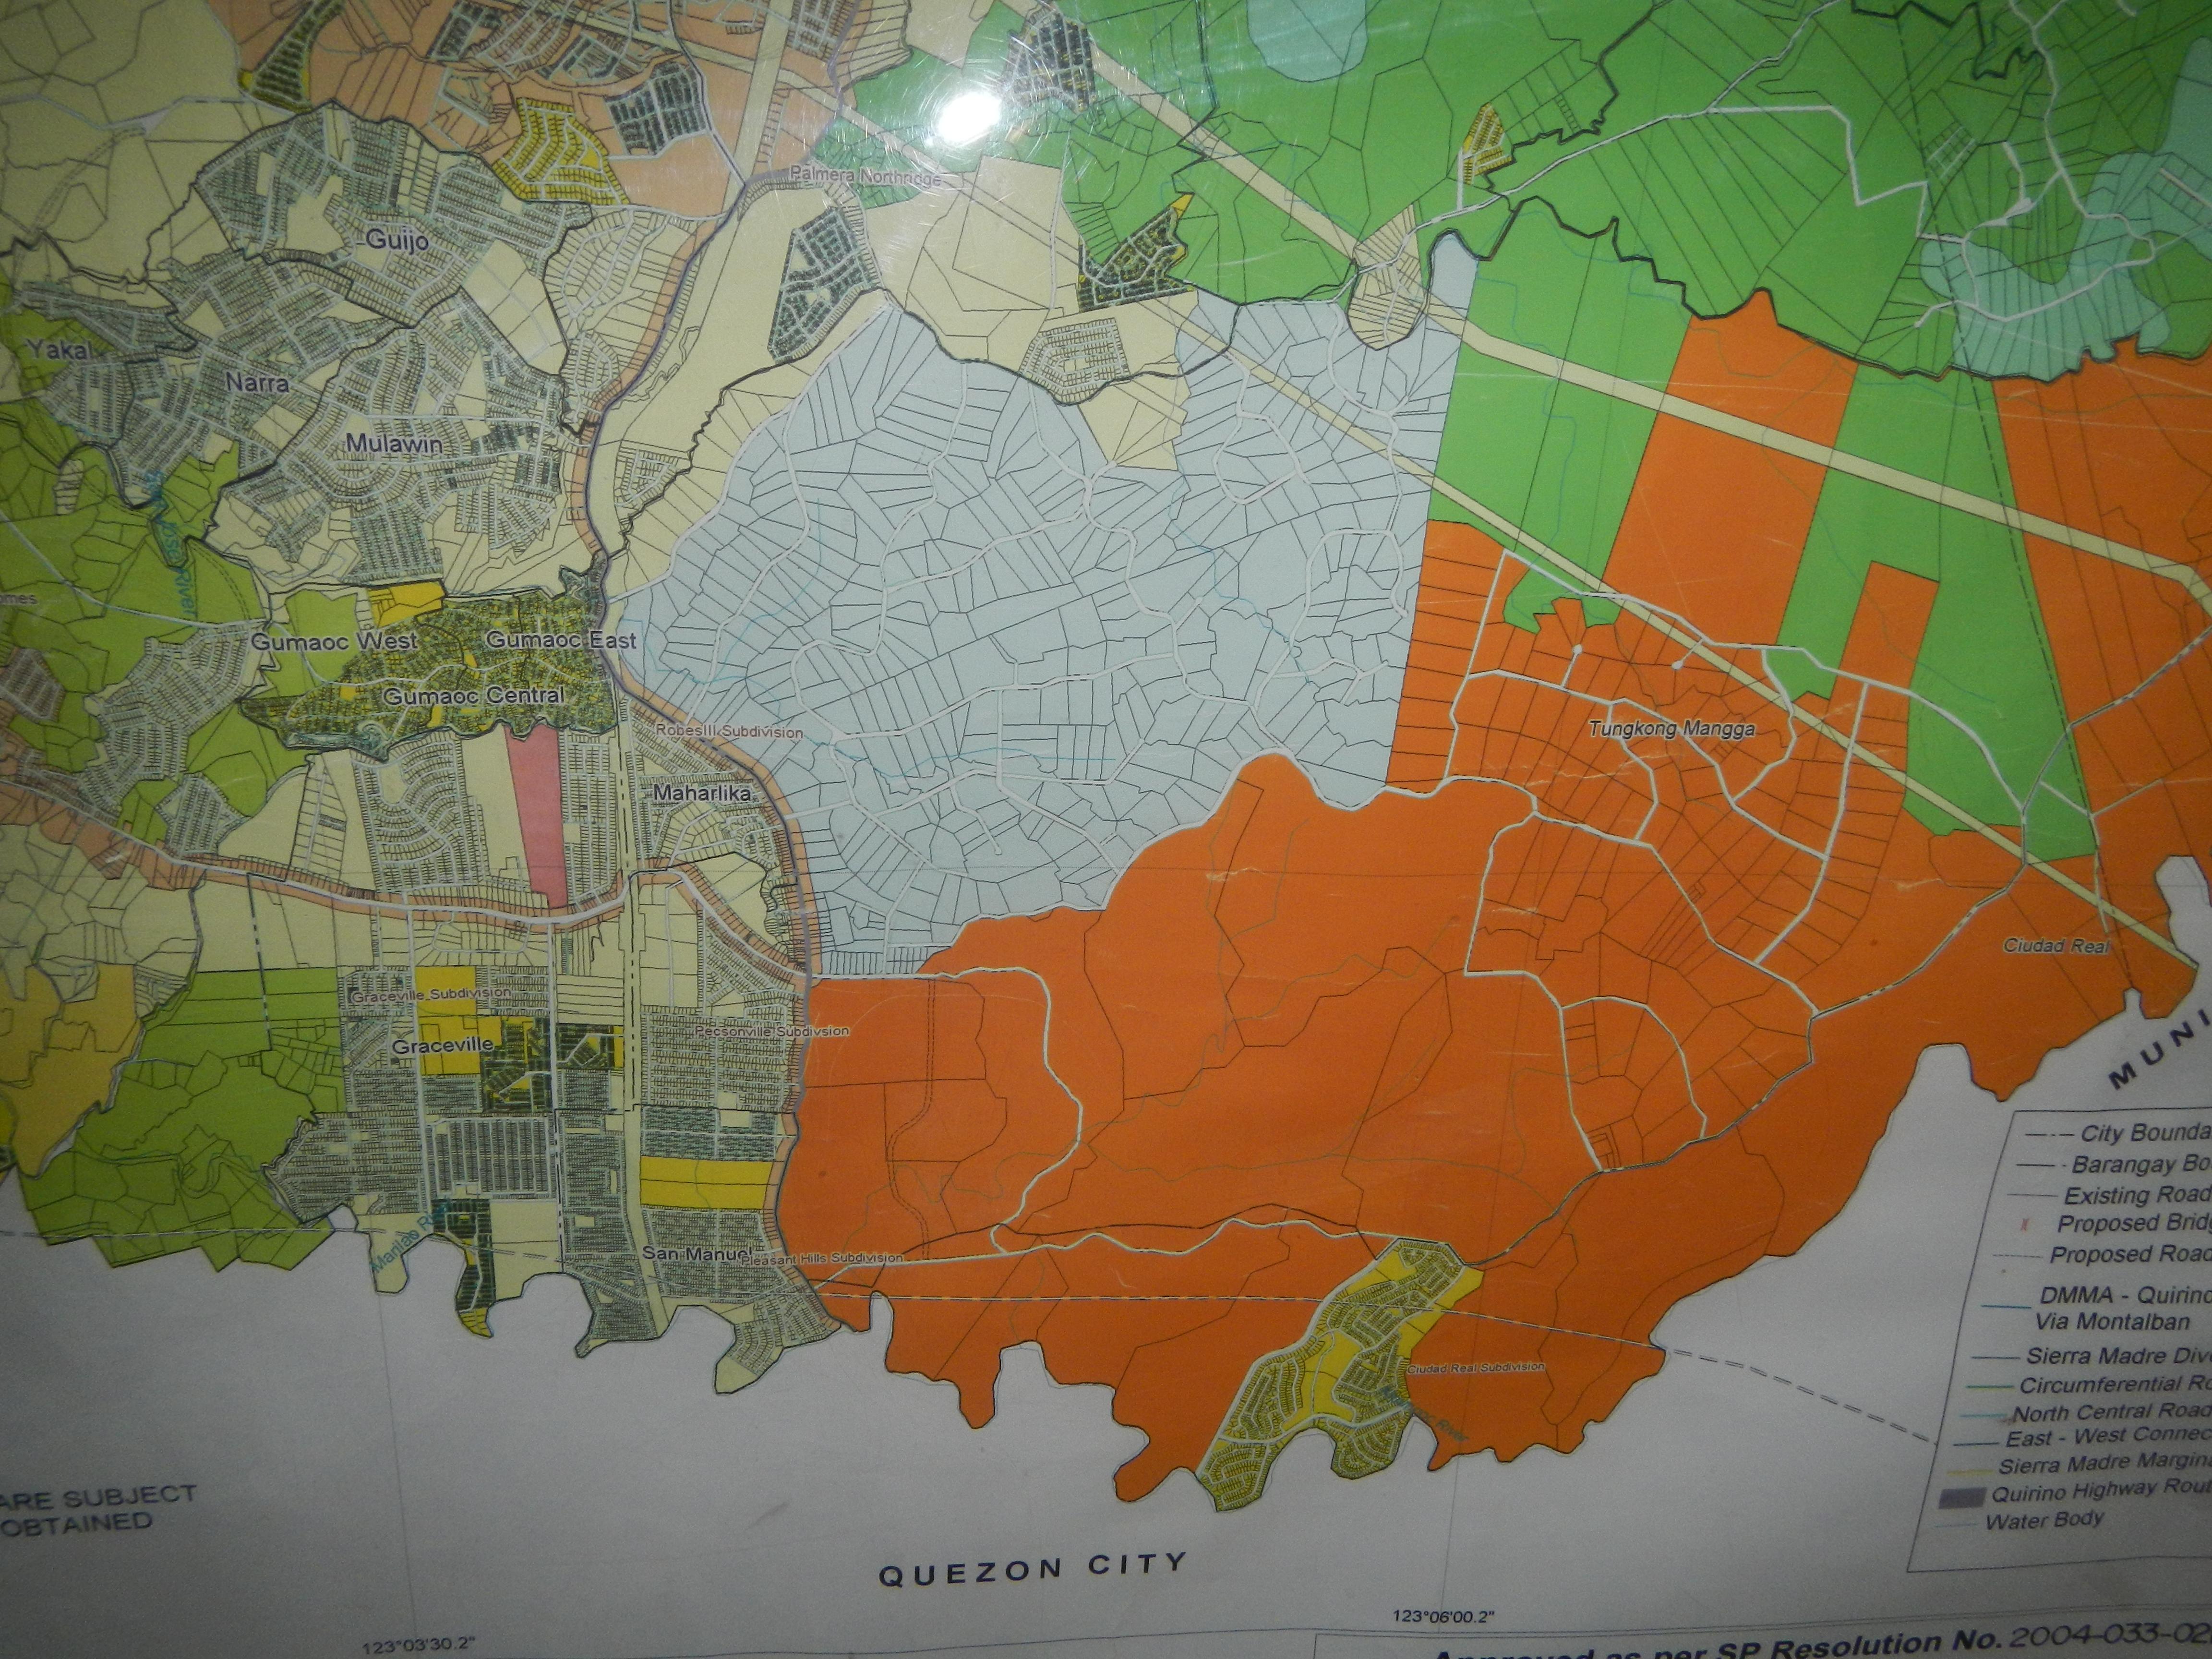 File:6226Maps San Jose del Monte City Bulacanjfvf 12.JPG ...